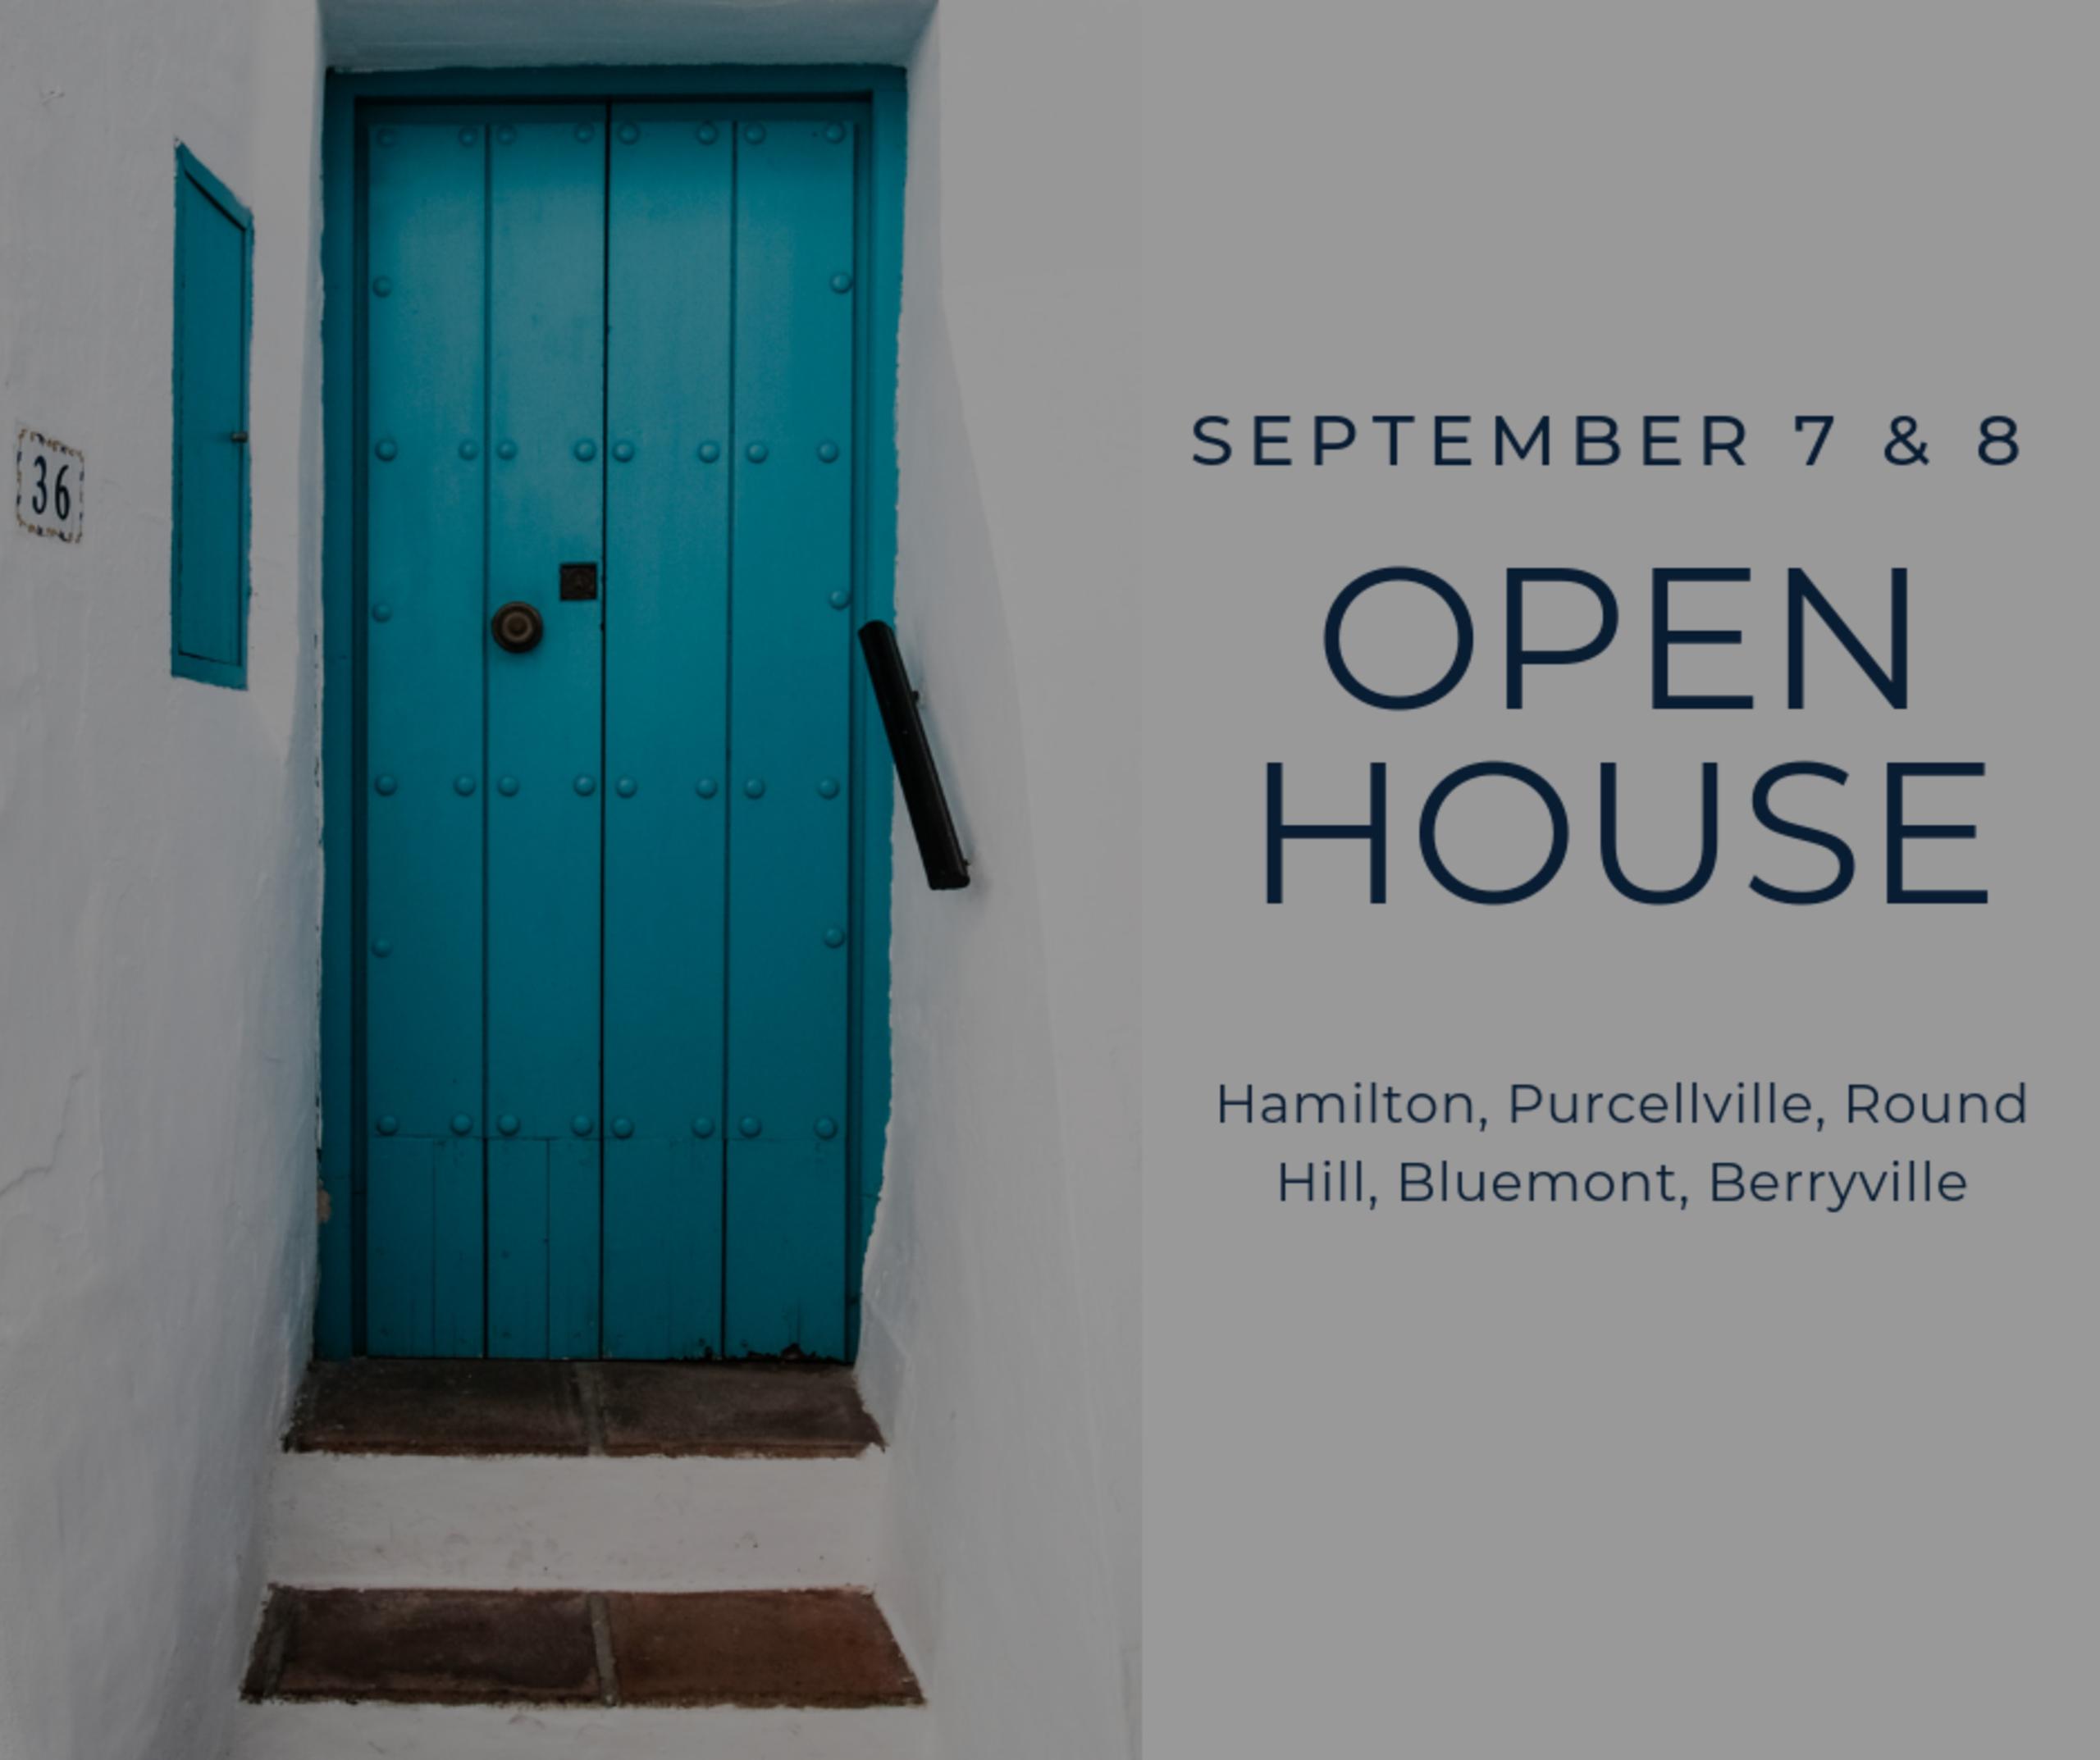 Open House List 9/7/19 – 9/8/19